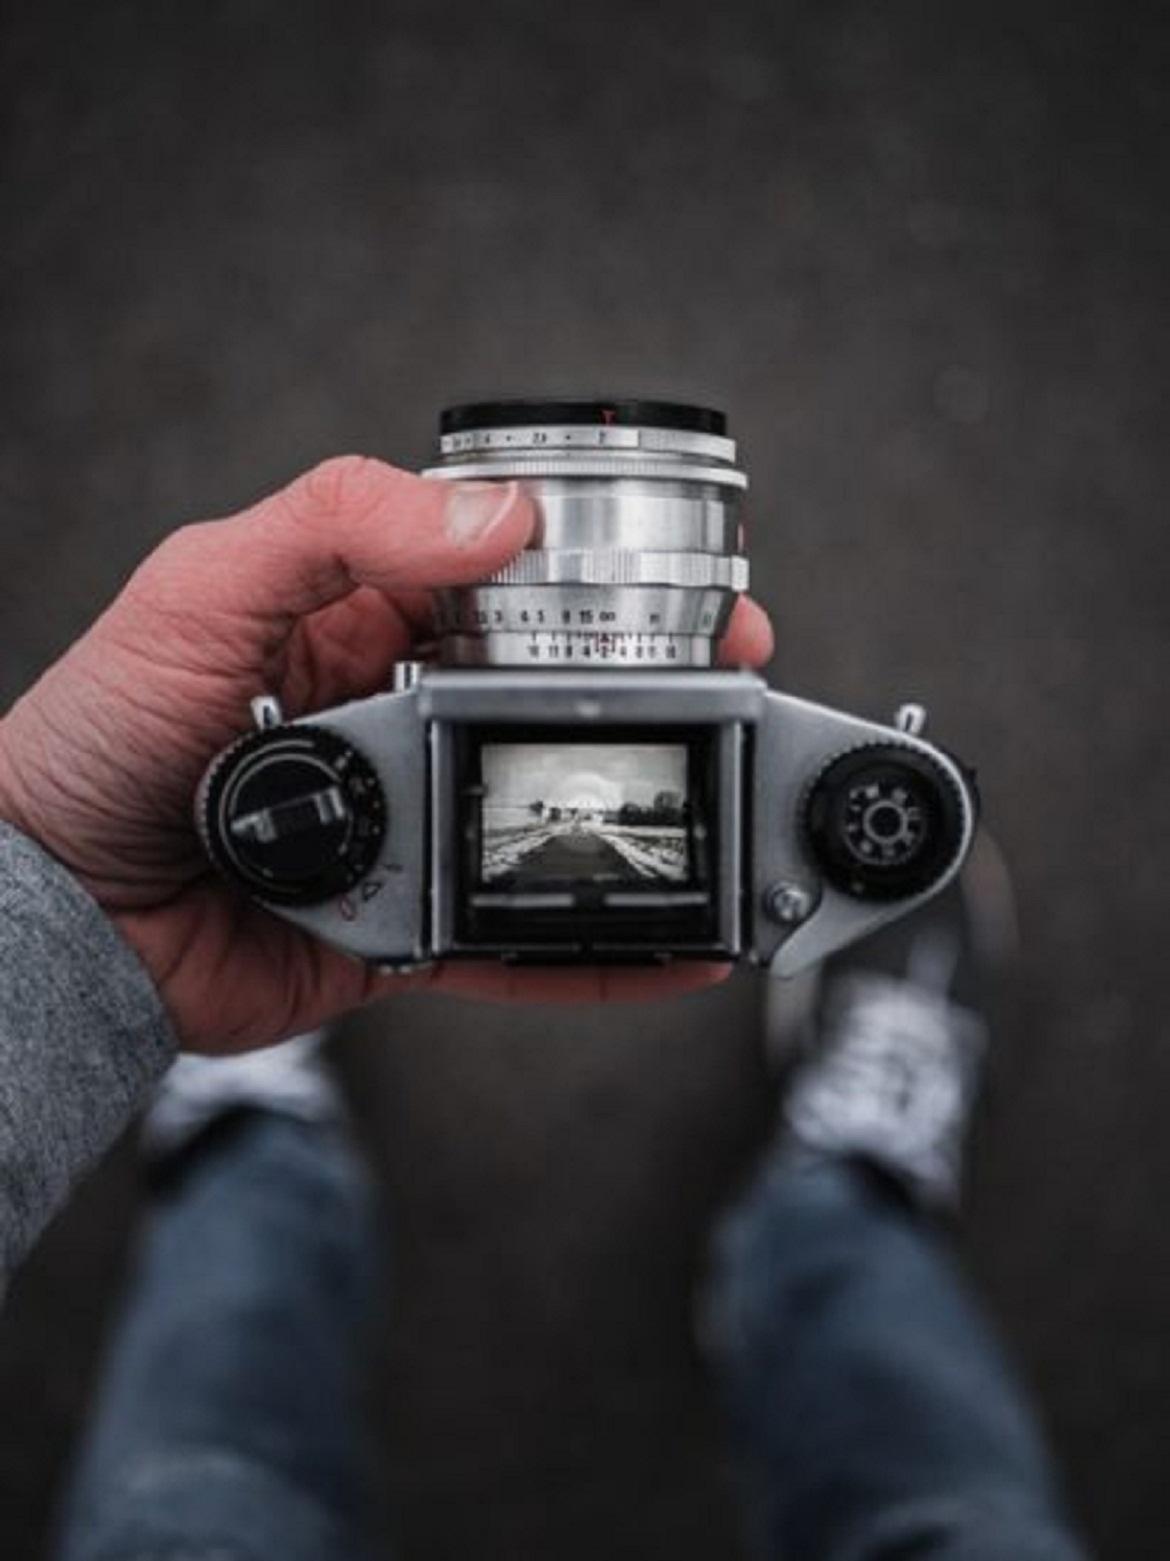 meilleur appareil photo hybride